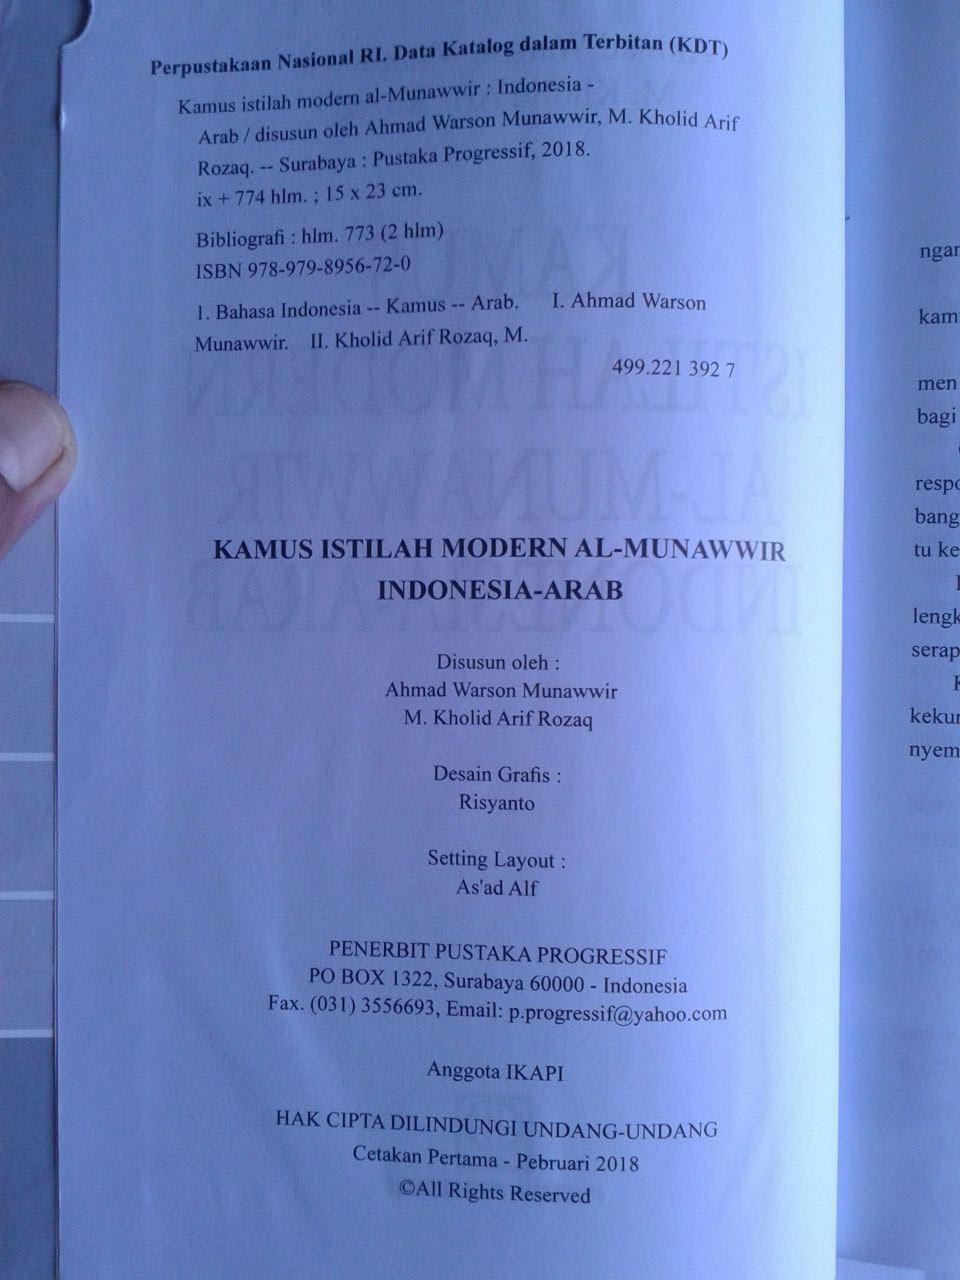 Buku Kamus Istilah Modern Al-Munawwir Indonesia-Arab isi 2